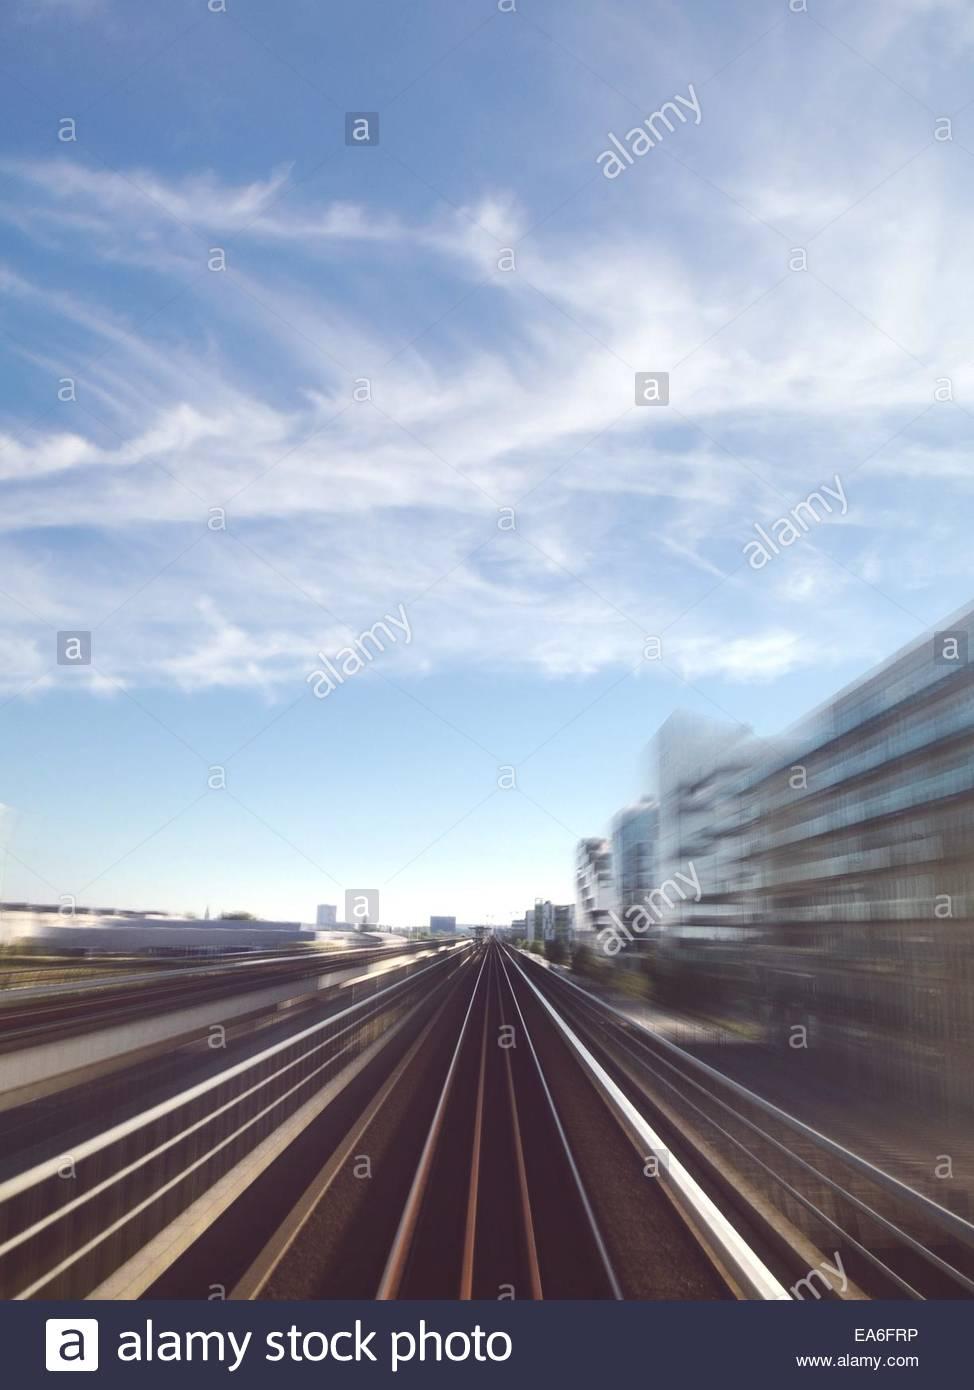 Denmark, Copenhagen, Railway tracks - Stock Image